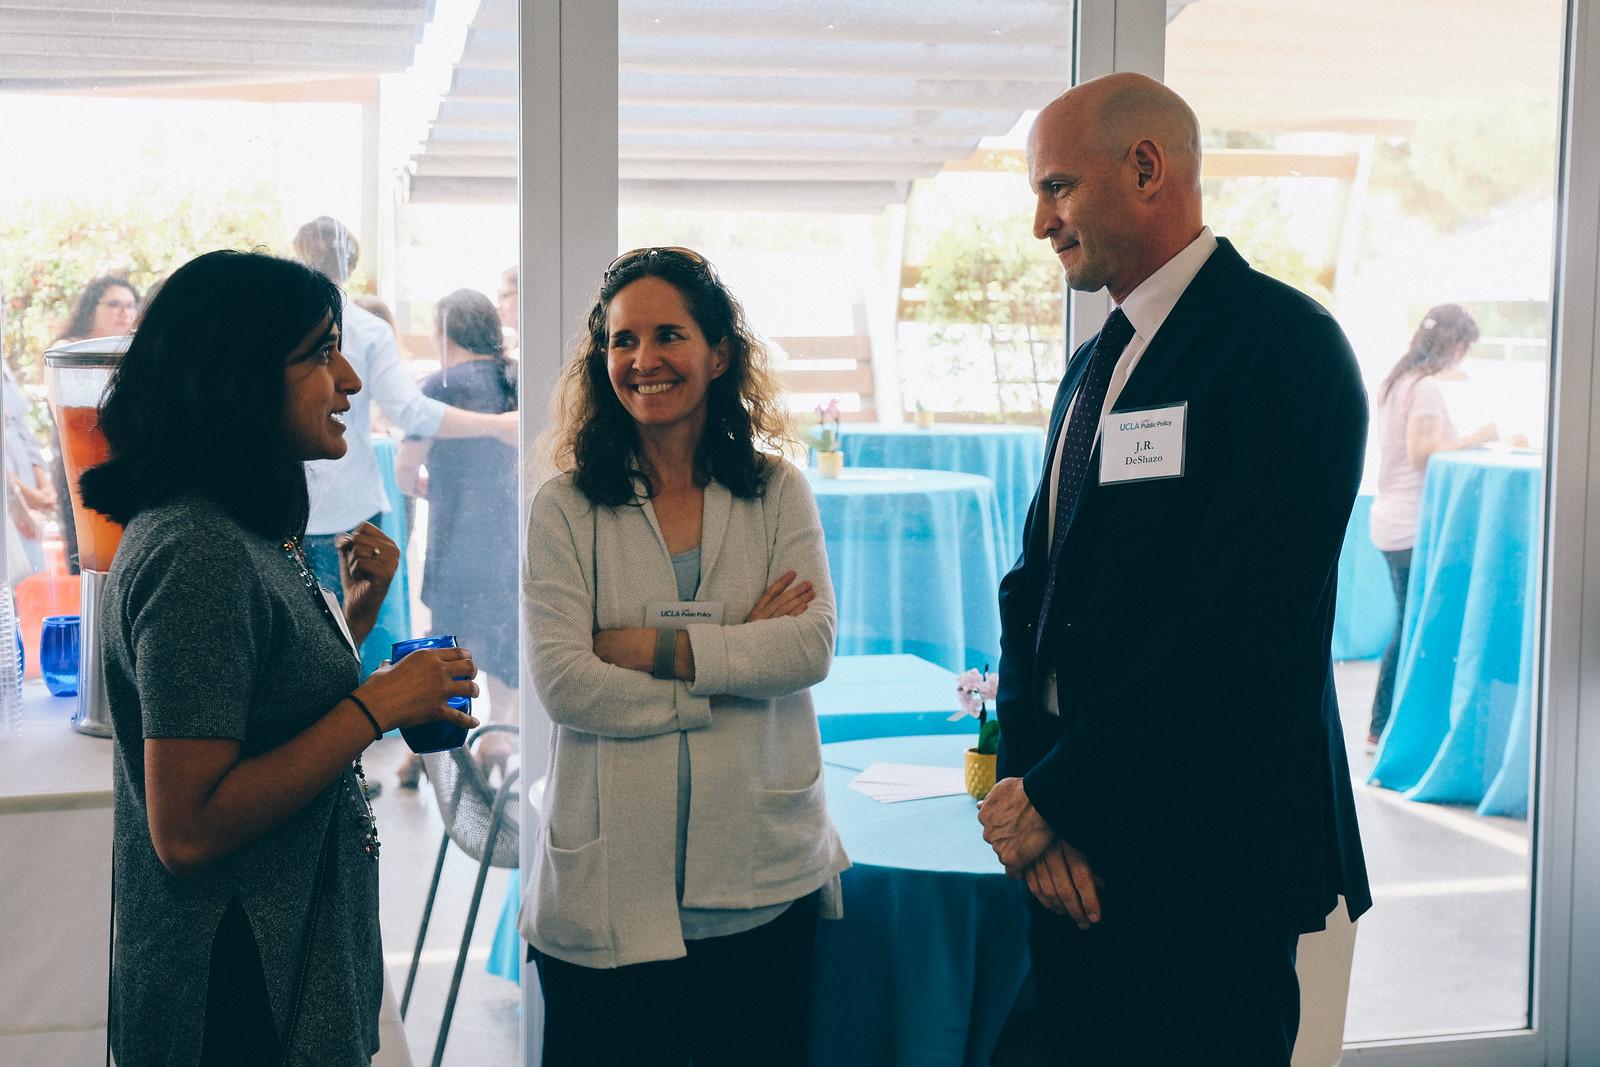 Public Policy Alumni Reception and Luncheon